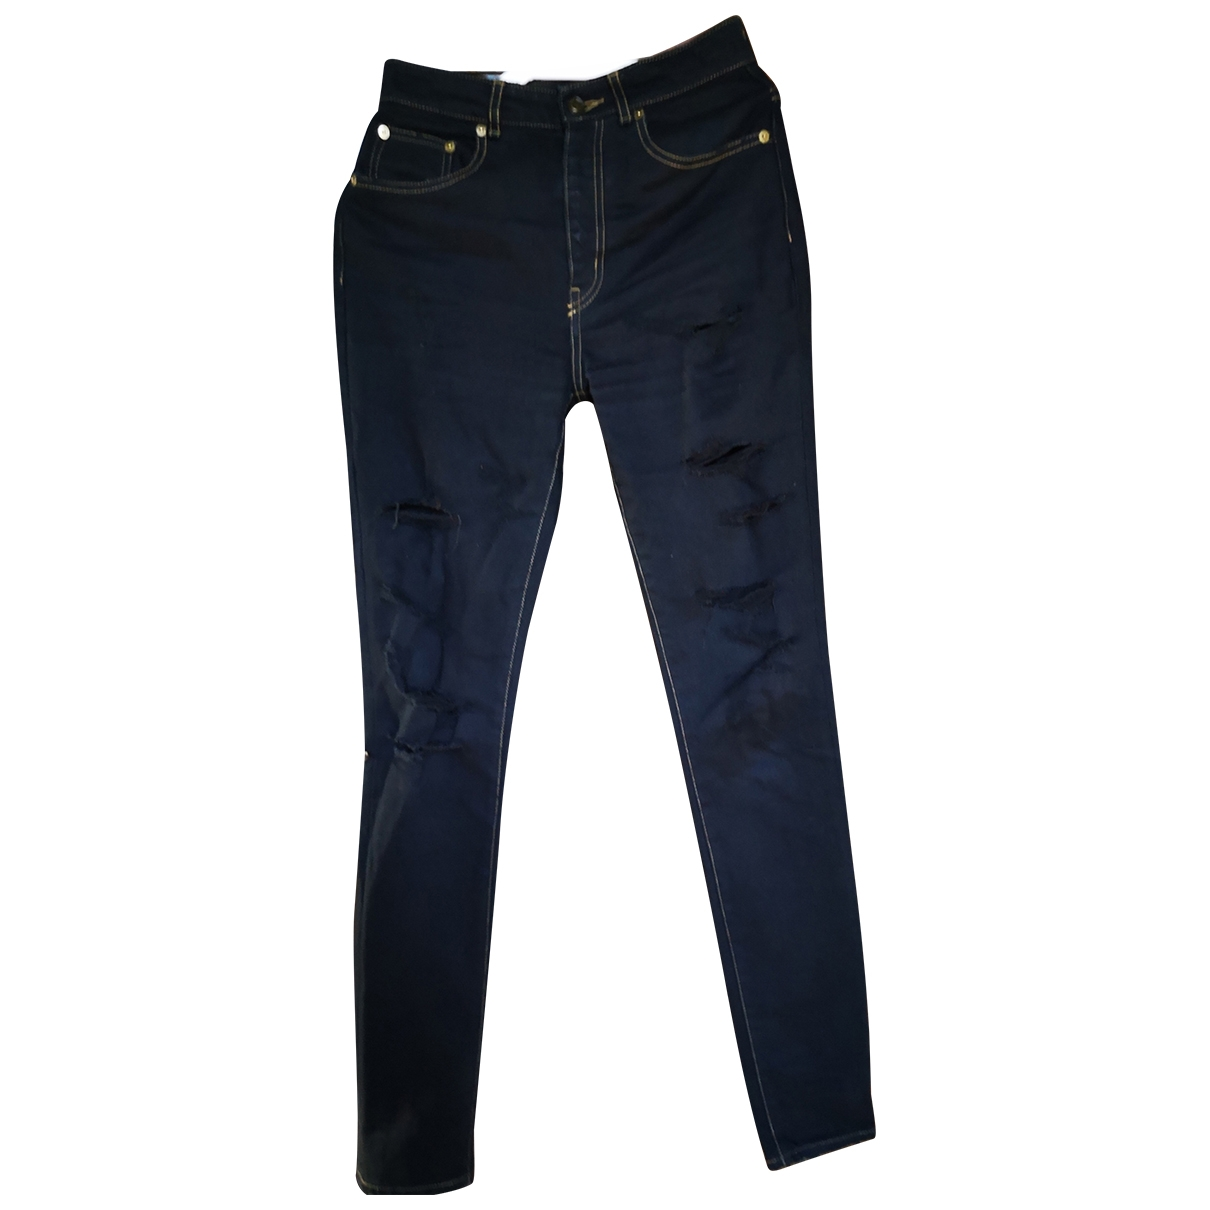 Saint Laurent \N Black Cotton - elasthane Jeans for Women 26 US